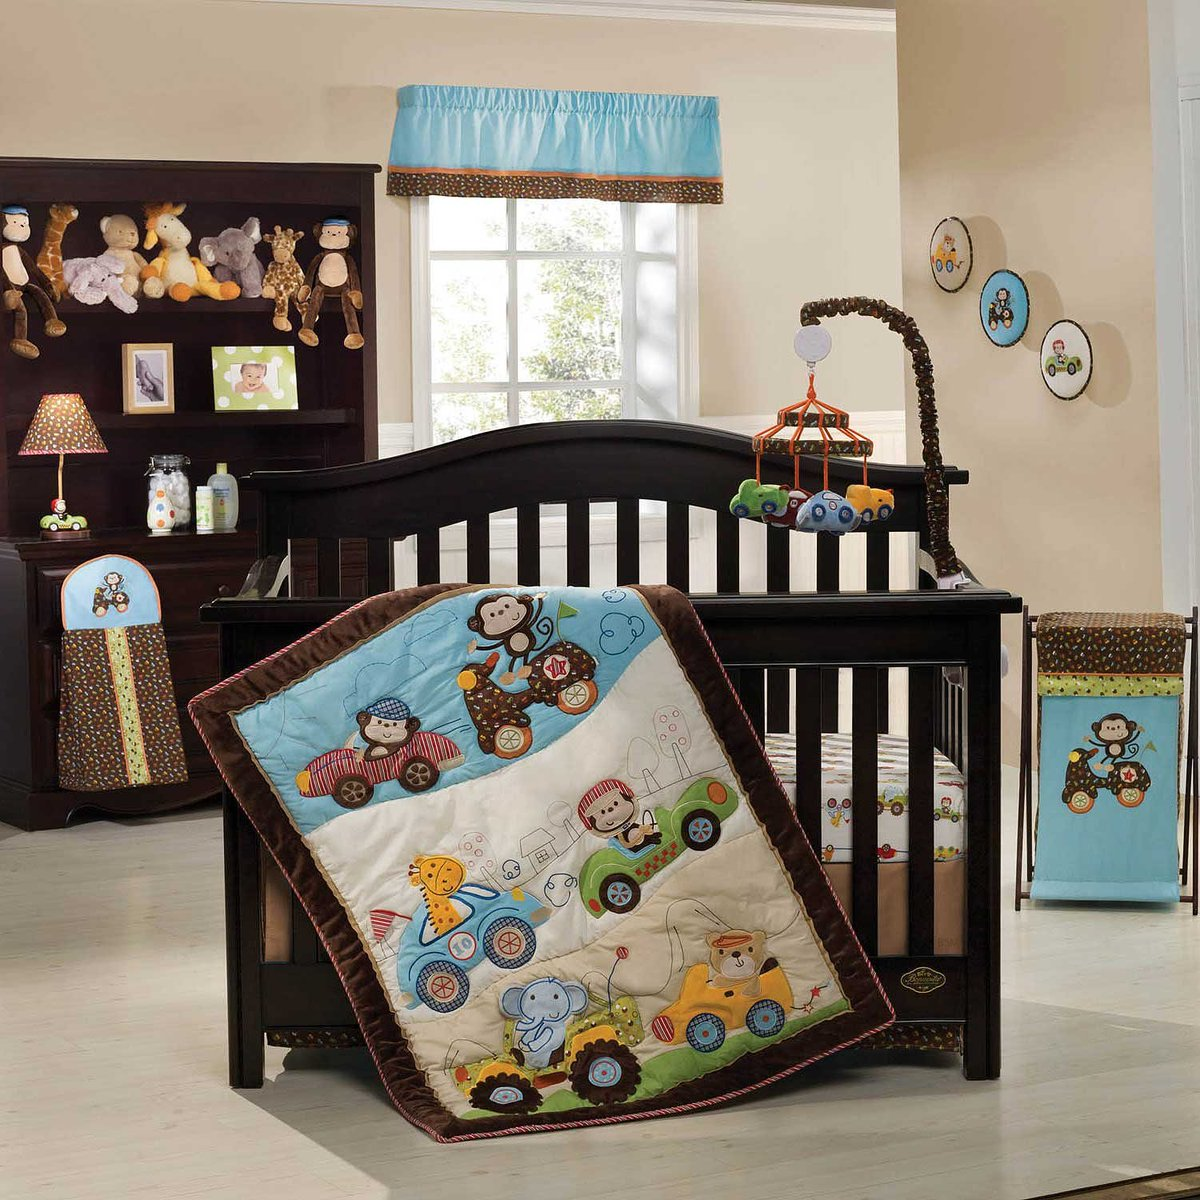 Baby cribs uae -  Babysuitsmarket